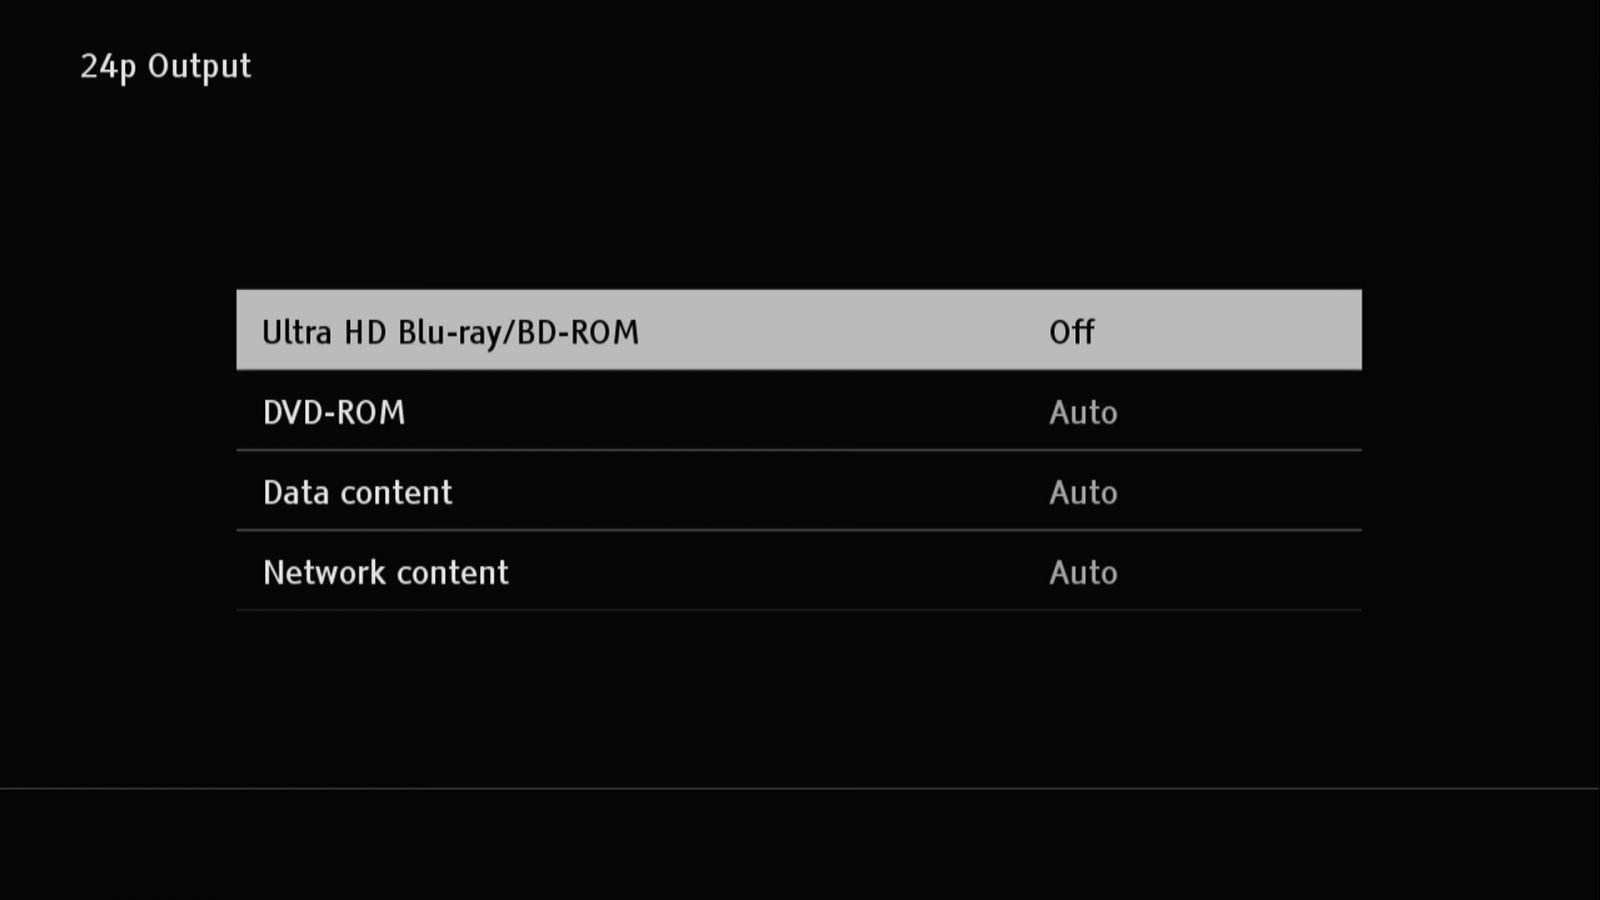 https://s1.occld.com/image/ca/kb/ca-1080f4kp_faqs_4k_passthrough_screen_settings_24p_output_Ultra_HD.jpg